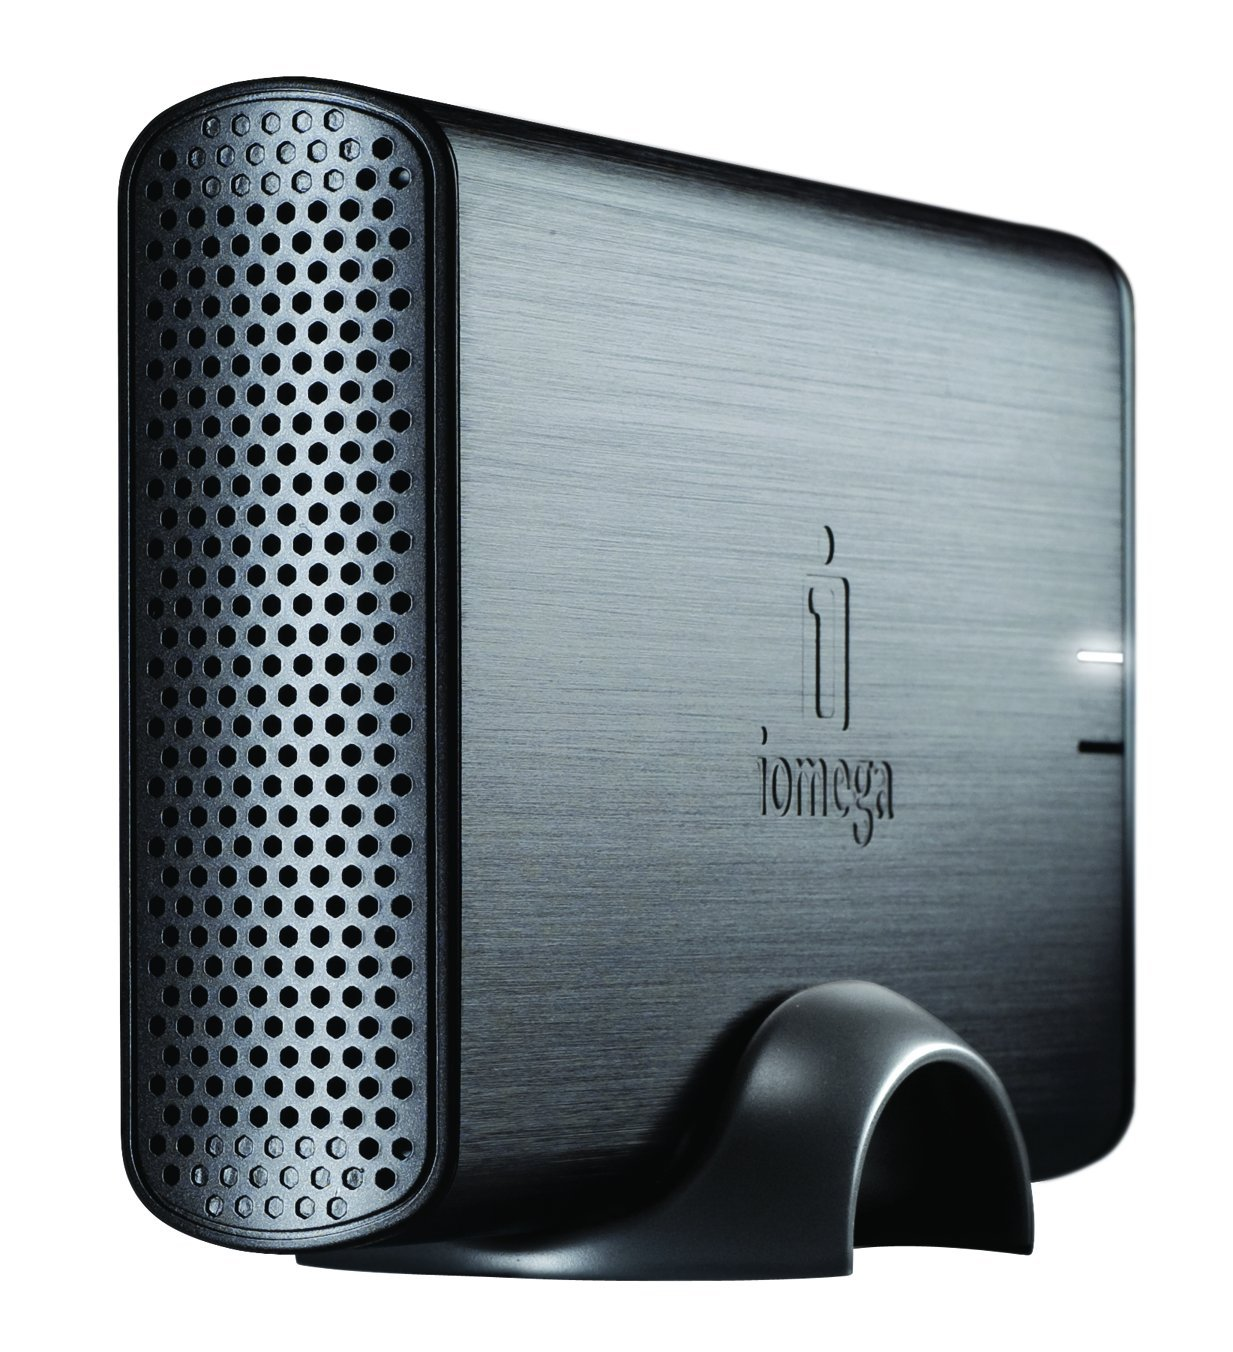 Amazon.com: Iomega Home Media 2 TB Network Attached Storage 34571 ...